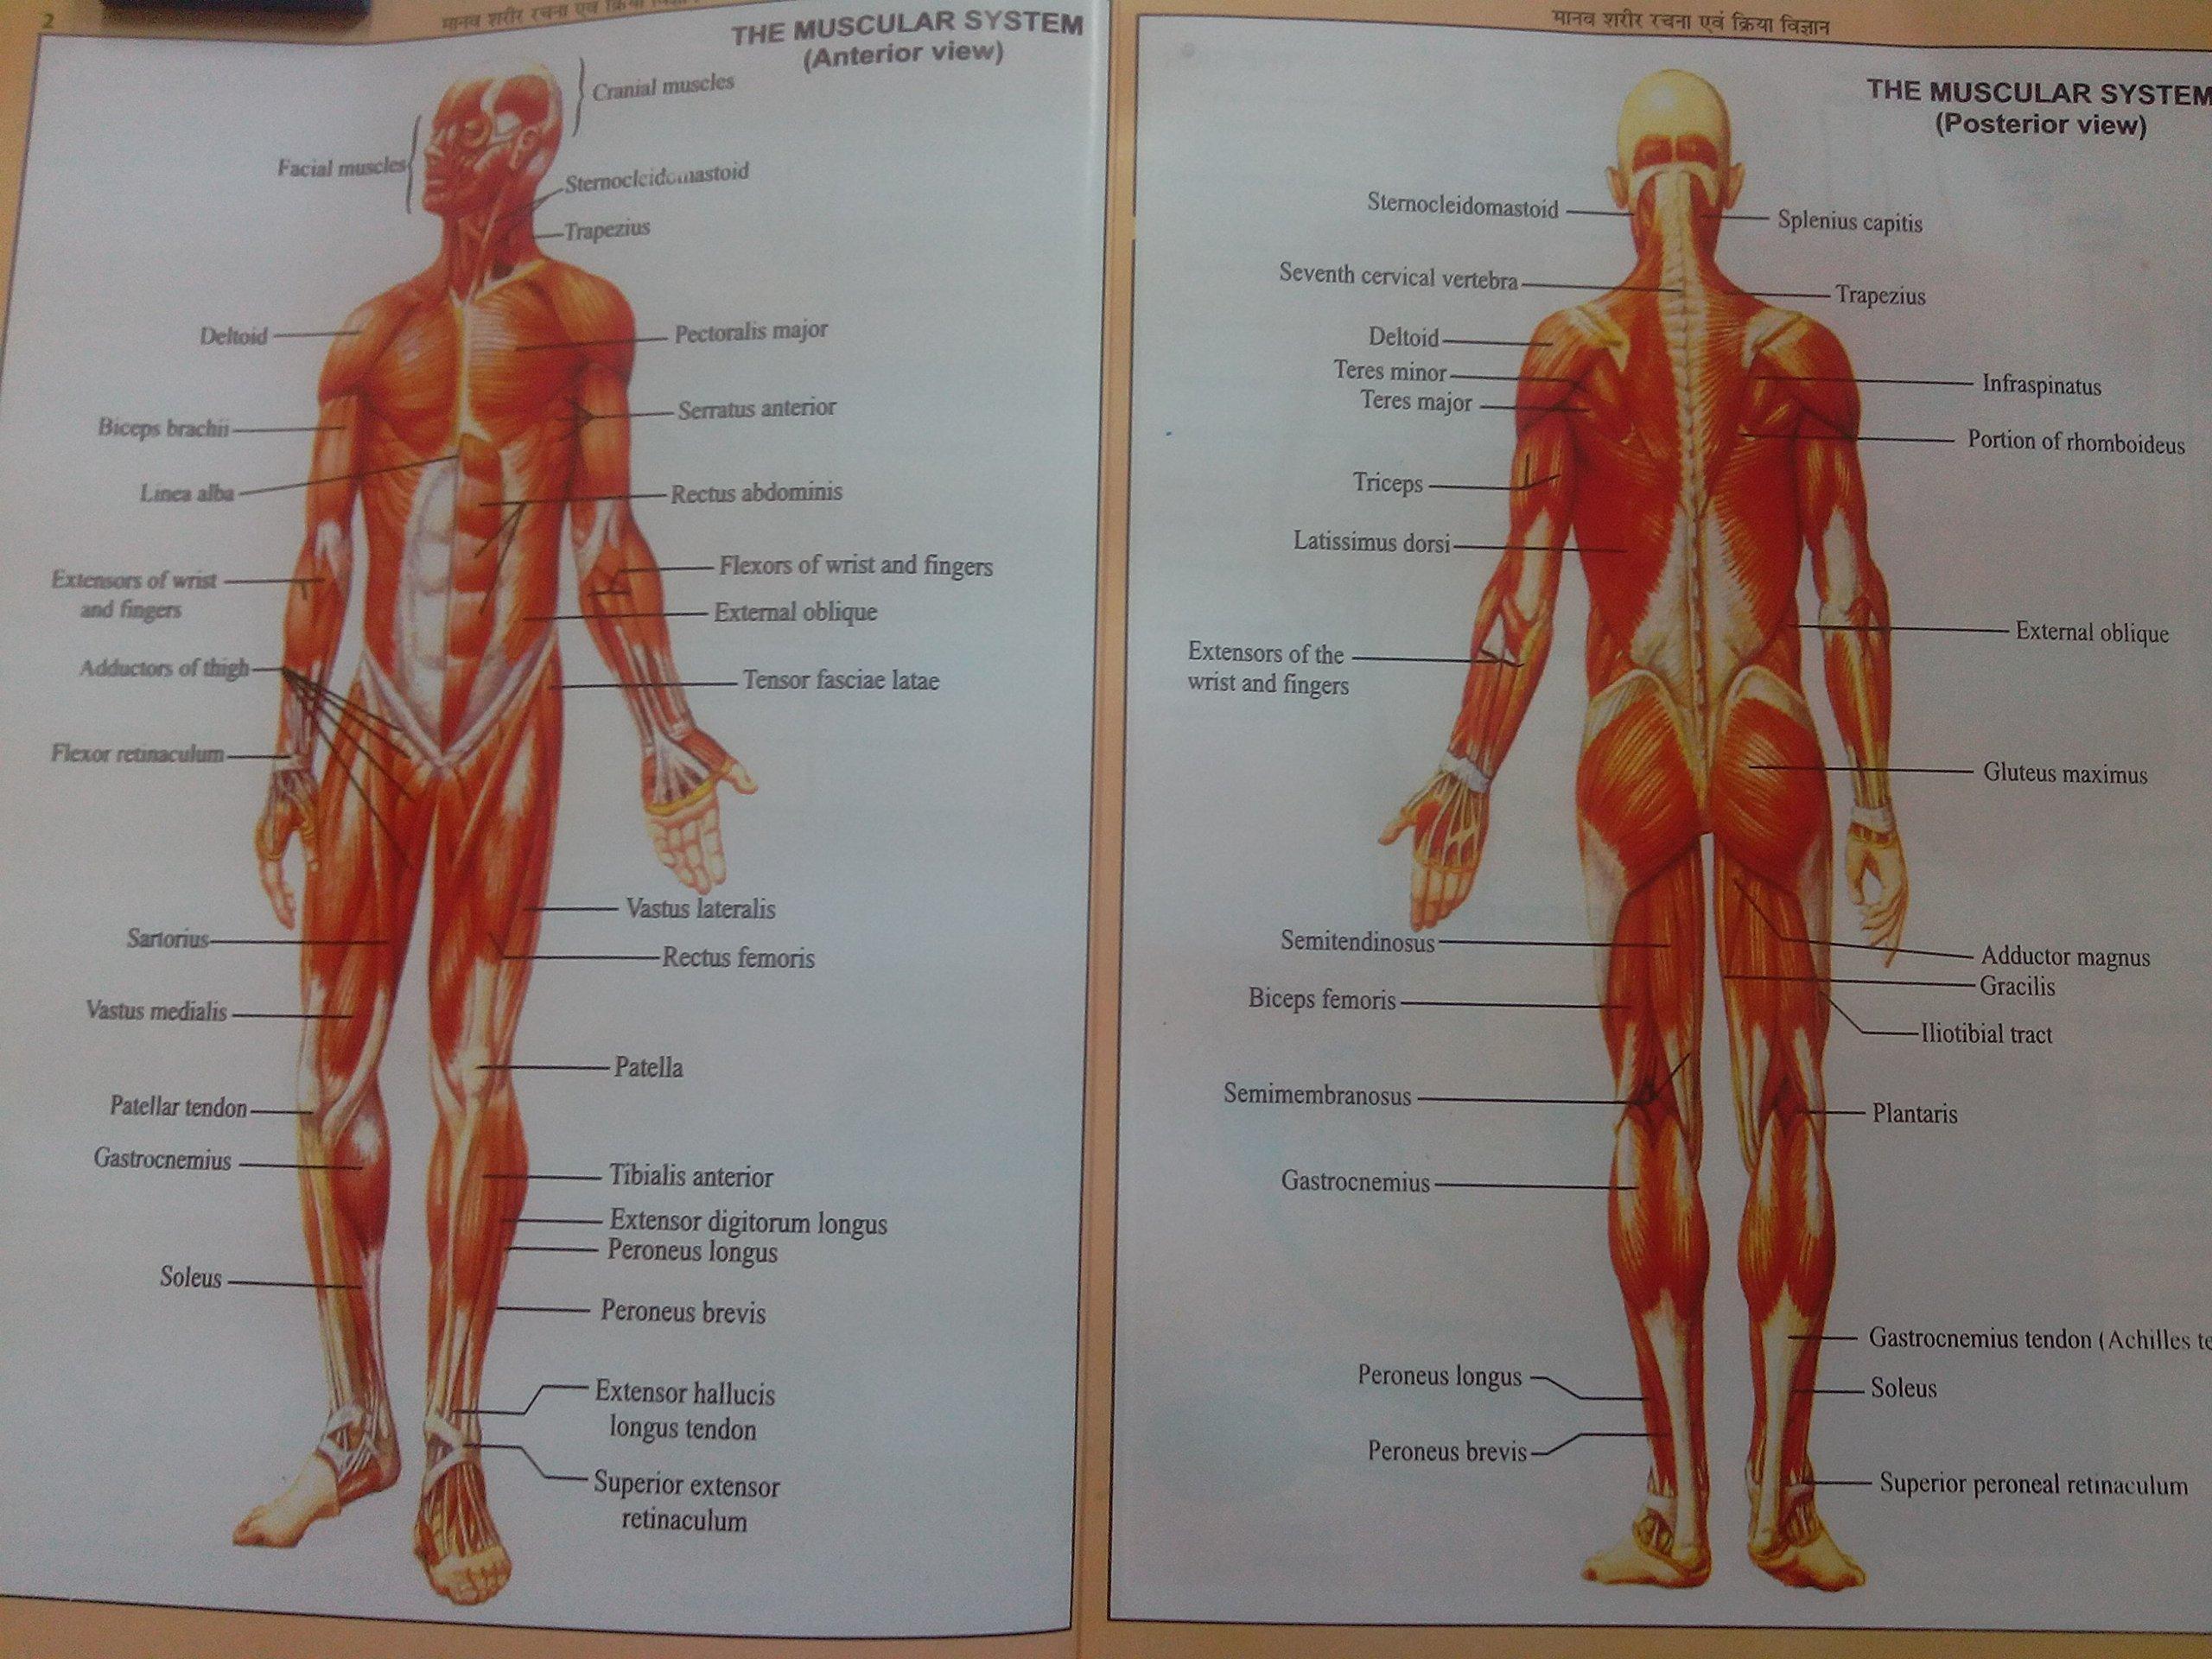 Human Anatomy And Physiology (Hindi): Dr.ANANT PRAKASH GUPTA ...